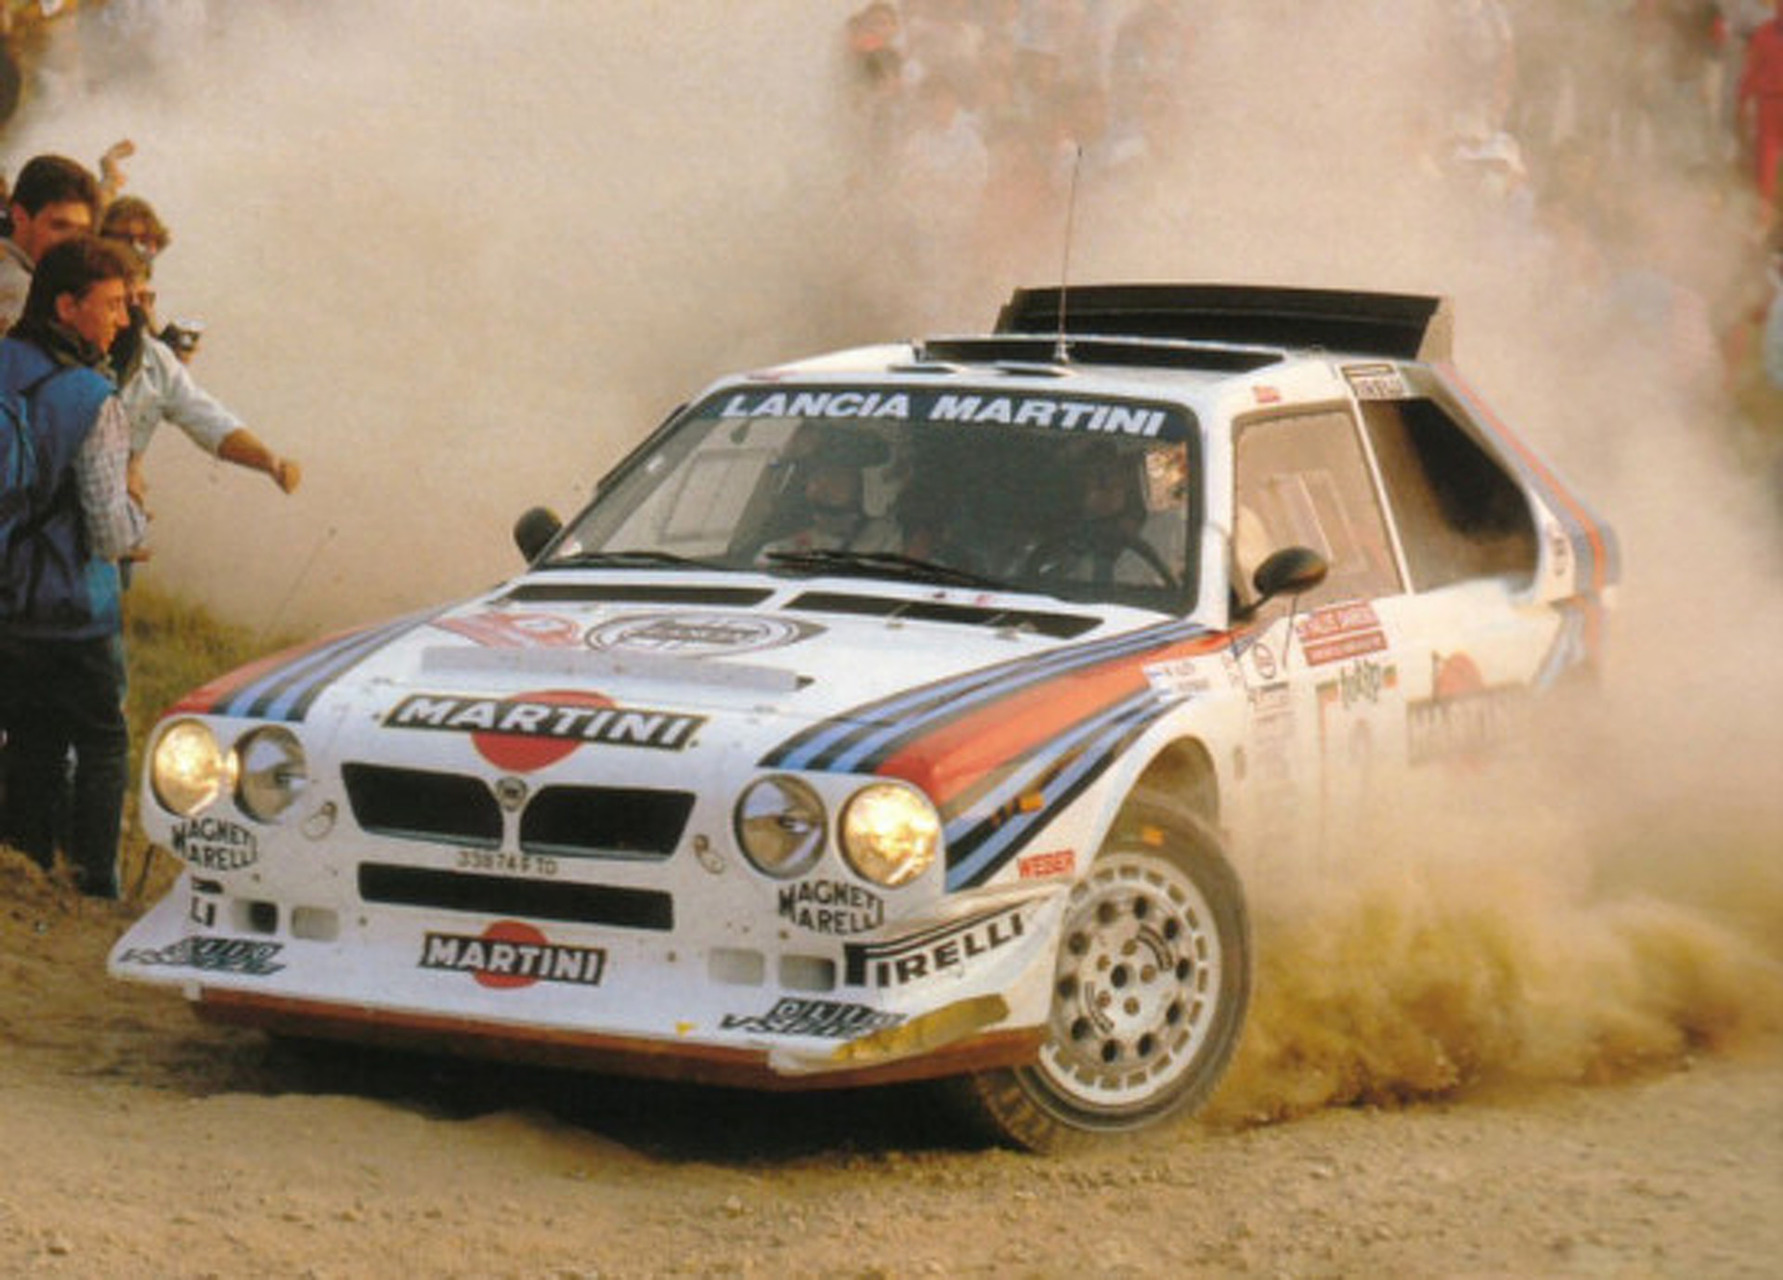 Group B Rally: The Wild, Deadly Era of Racing